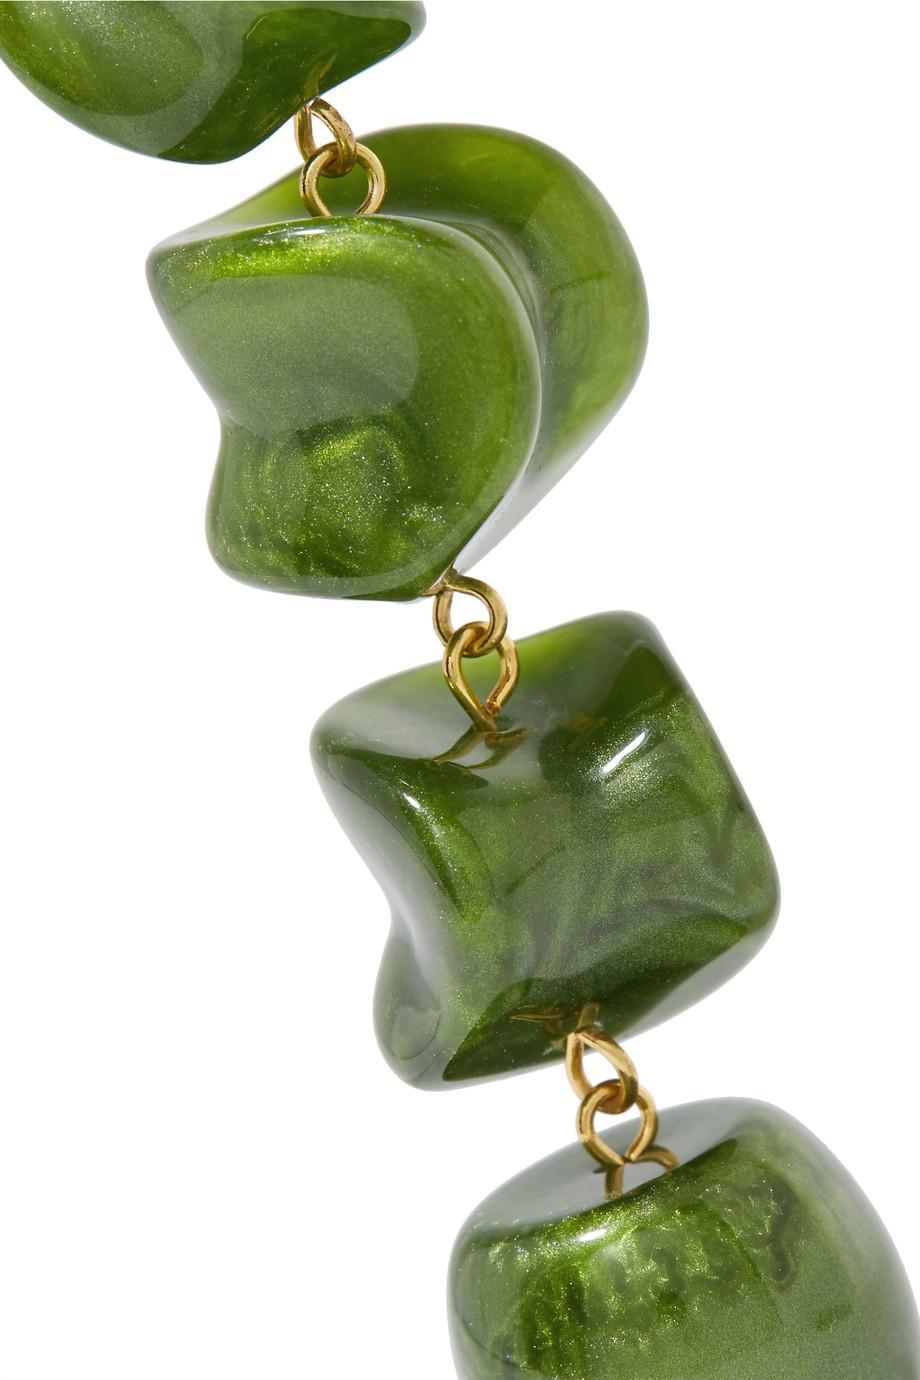 Leo Gold-tone Resin Earrings - Green Cult Gaia bPcwzfbTPj